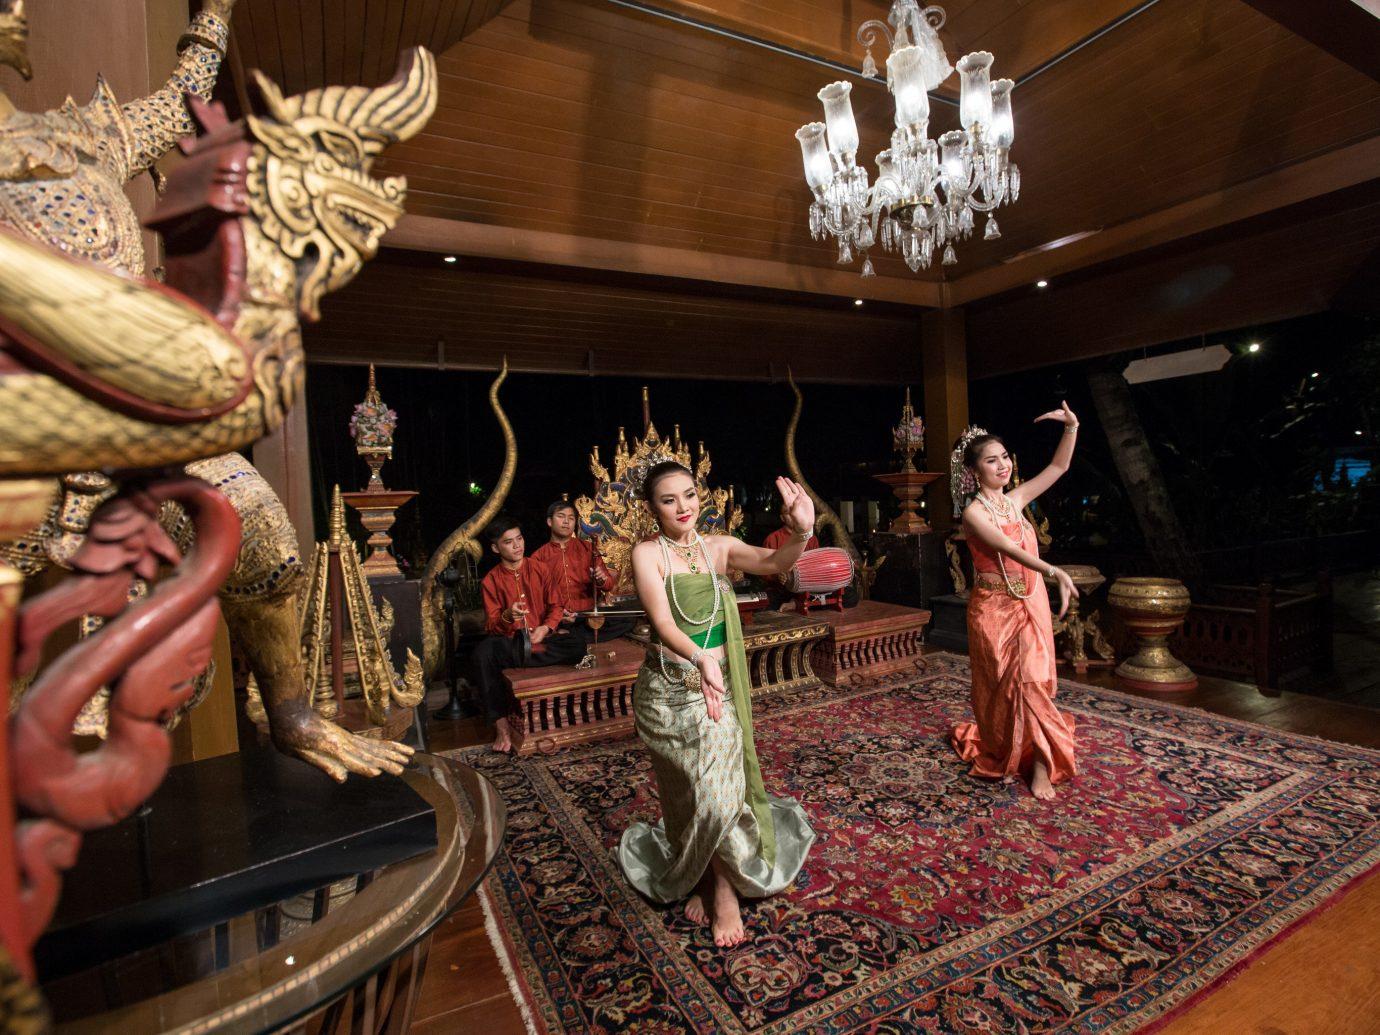 Romance Trip Ideas indoor temple tradition mythology